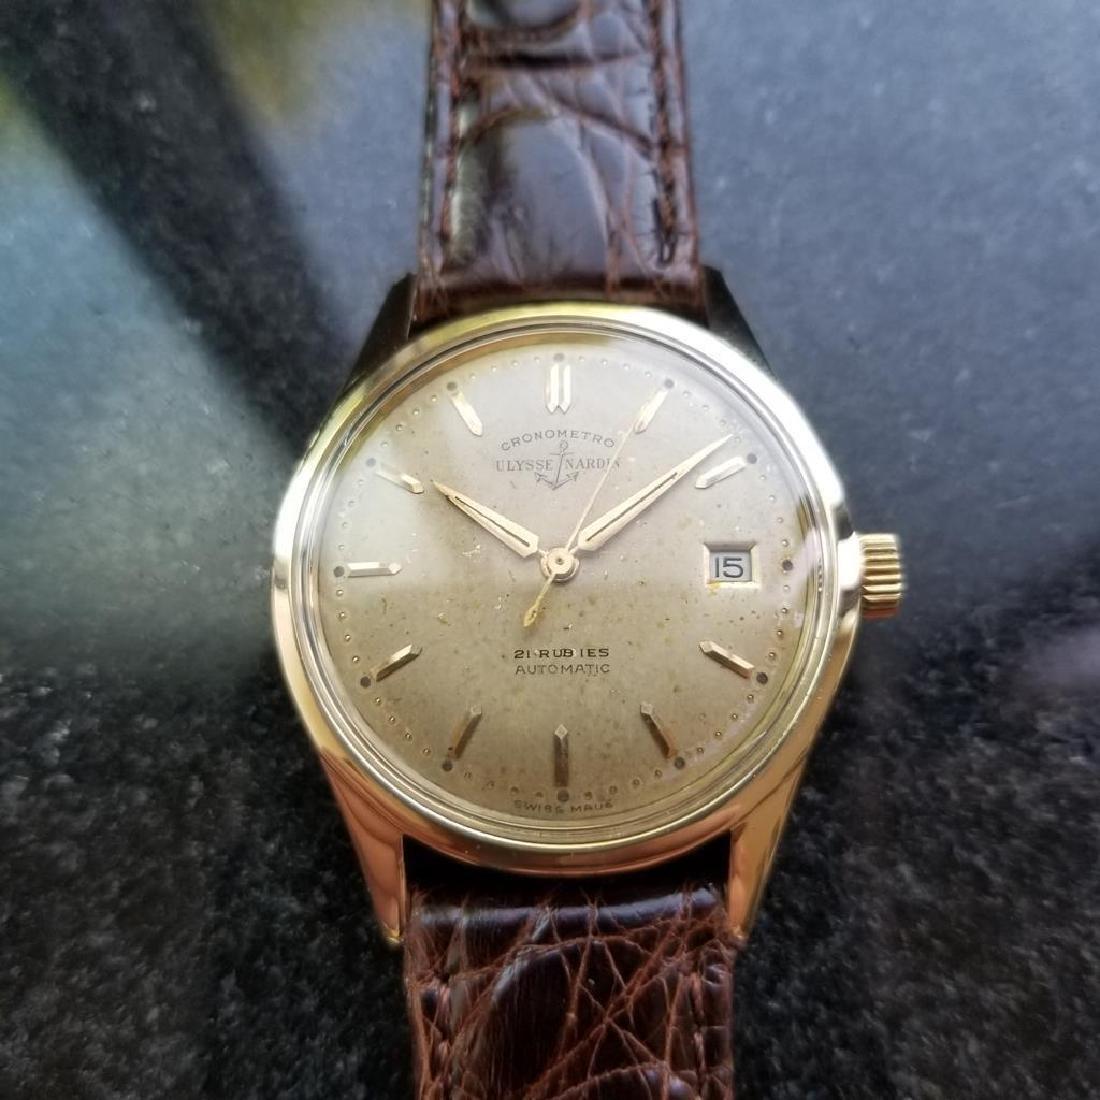 Vintage ULYSSE NARDIN Chronometer Automatic w/ date - 2